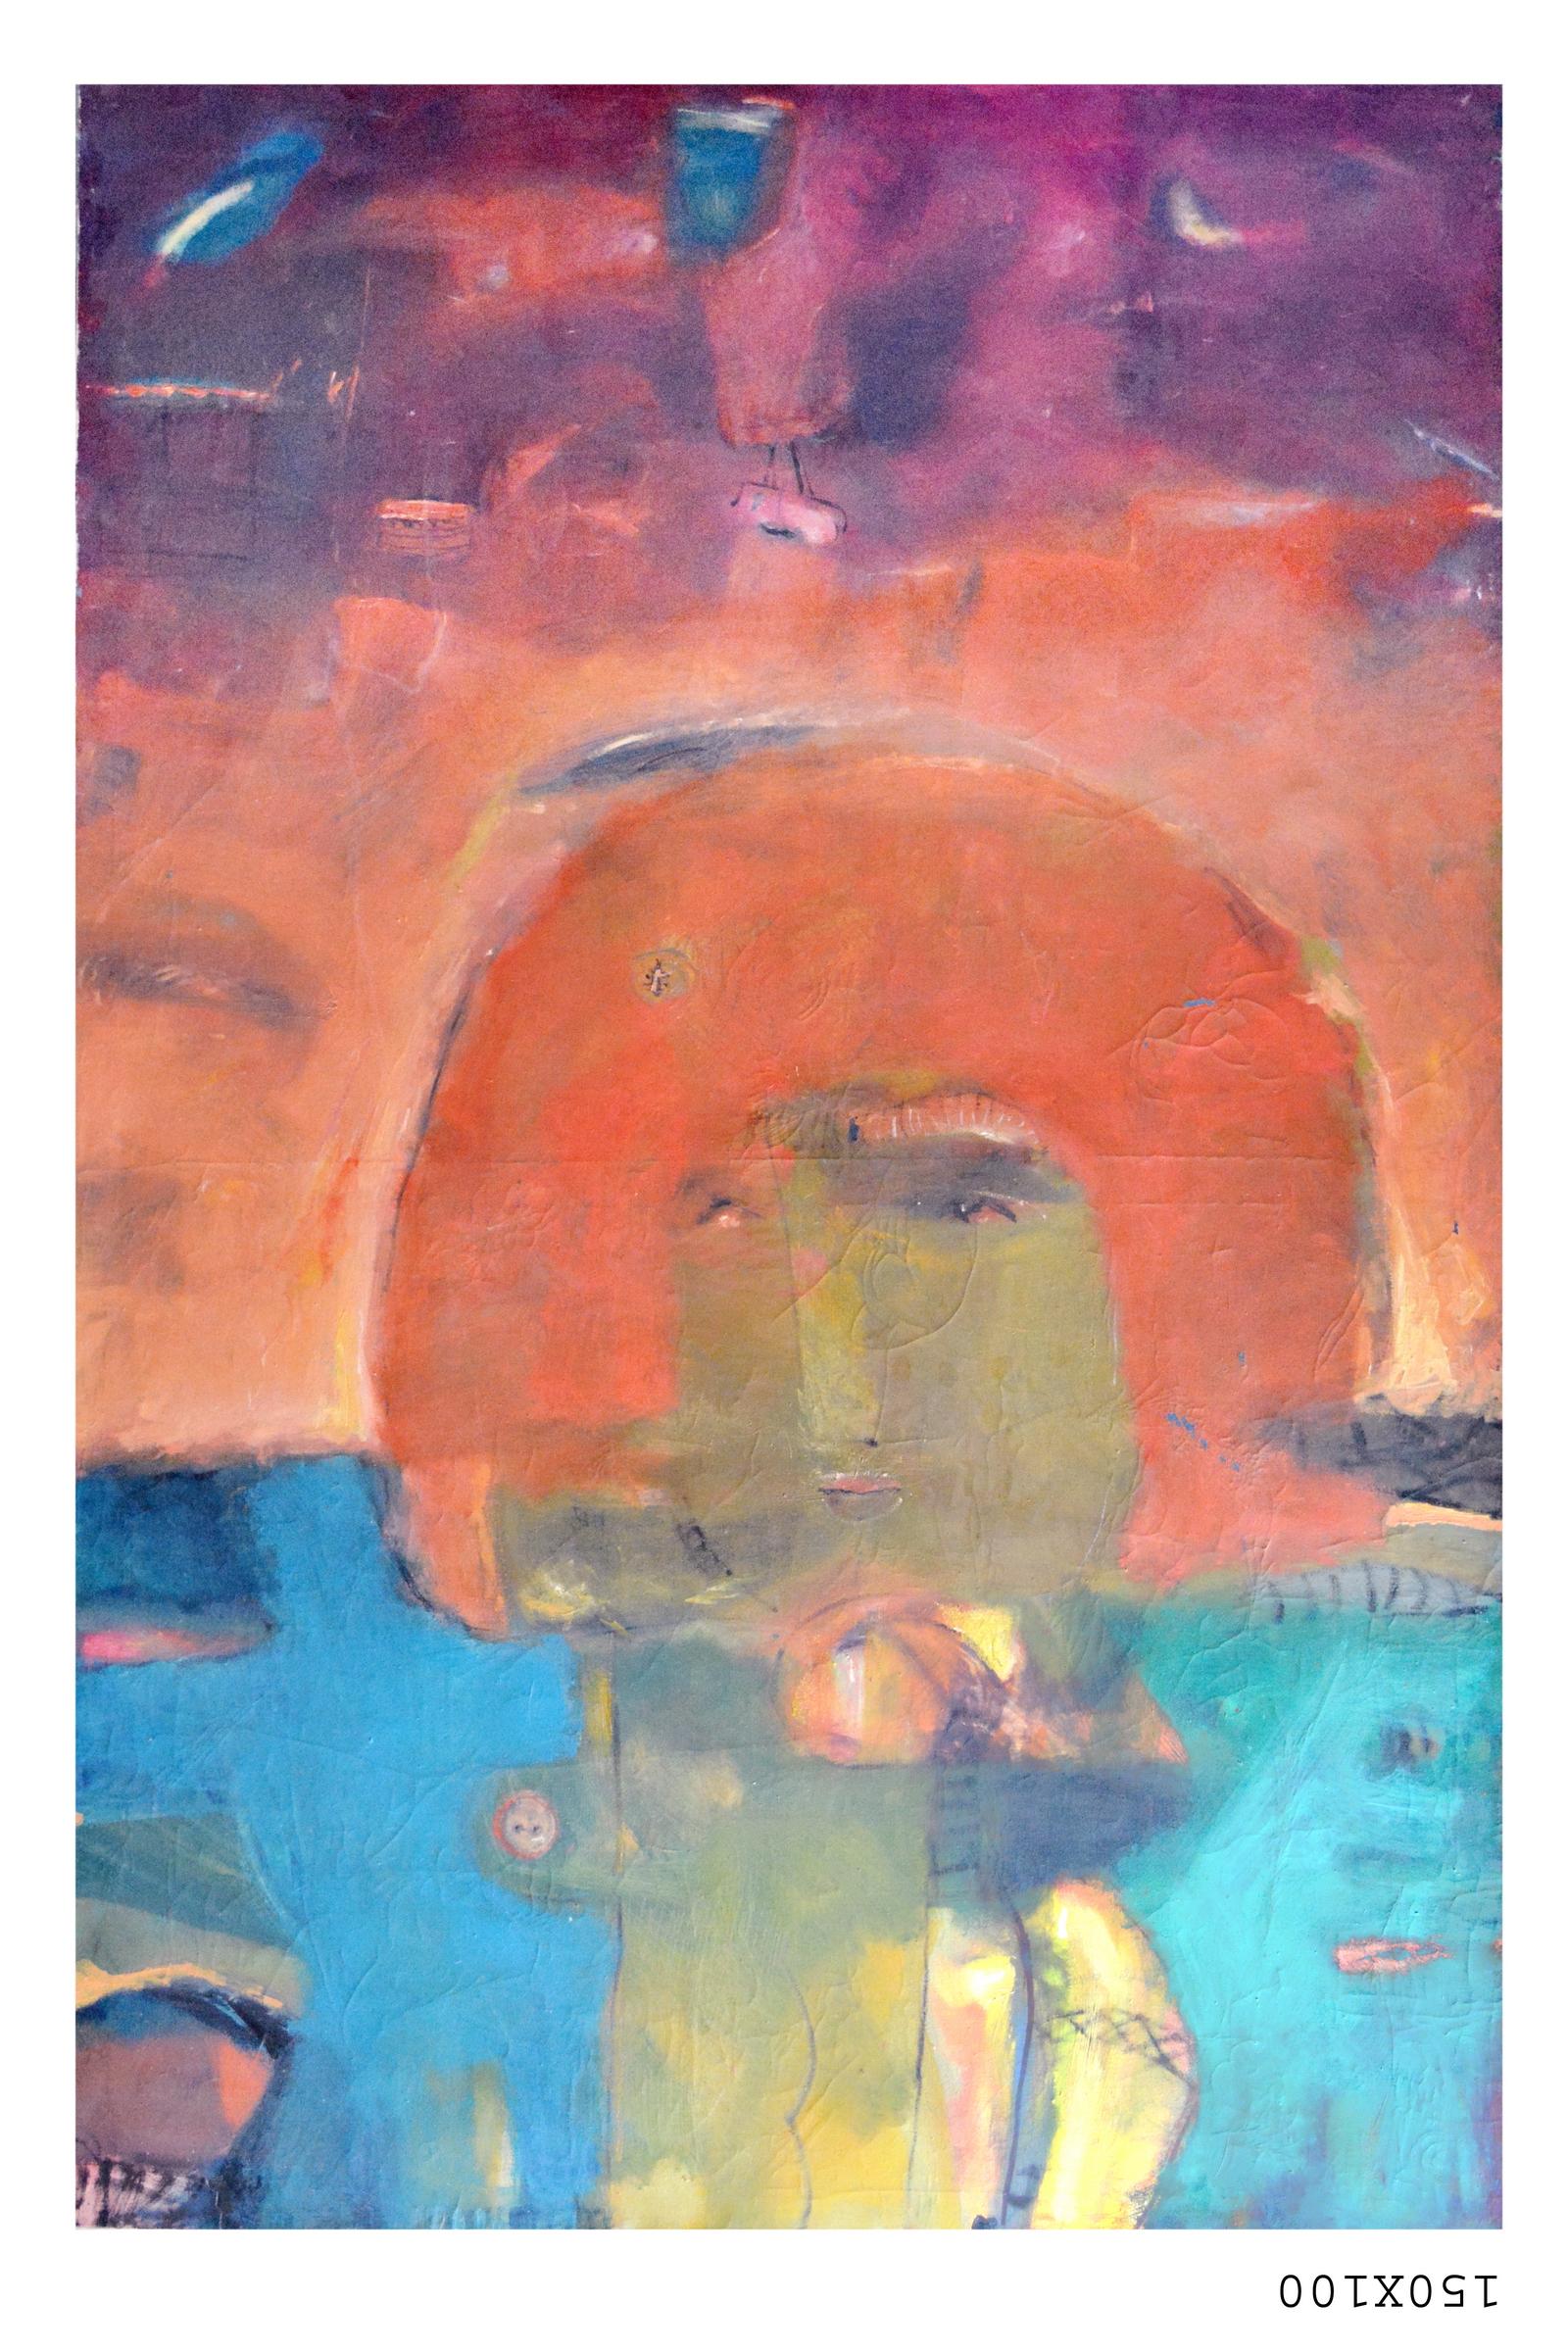 189_334 - Artist loai salahedeen 150 in 100 oil on canvas - الفنان لؤي صلاح الدين -.JPG